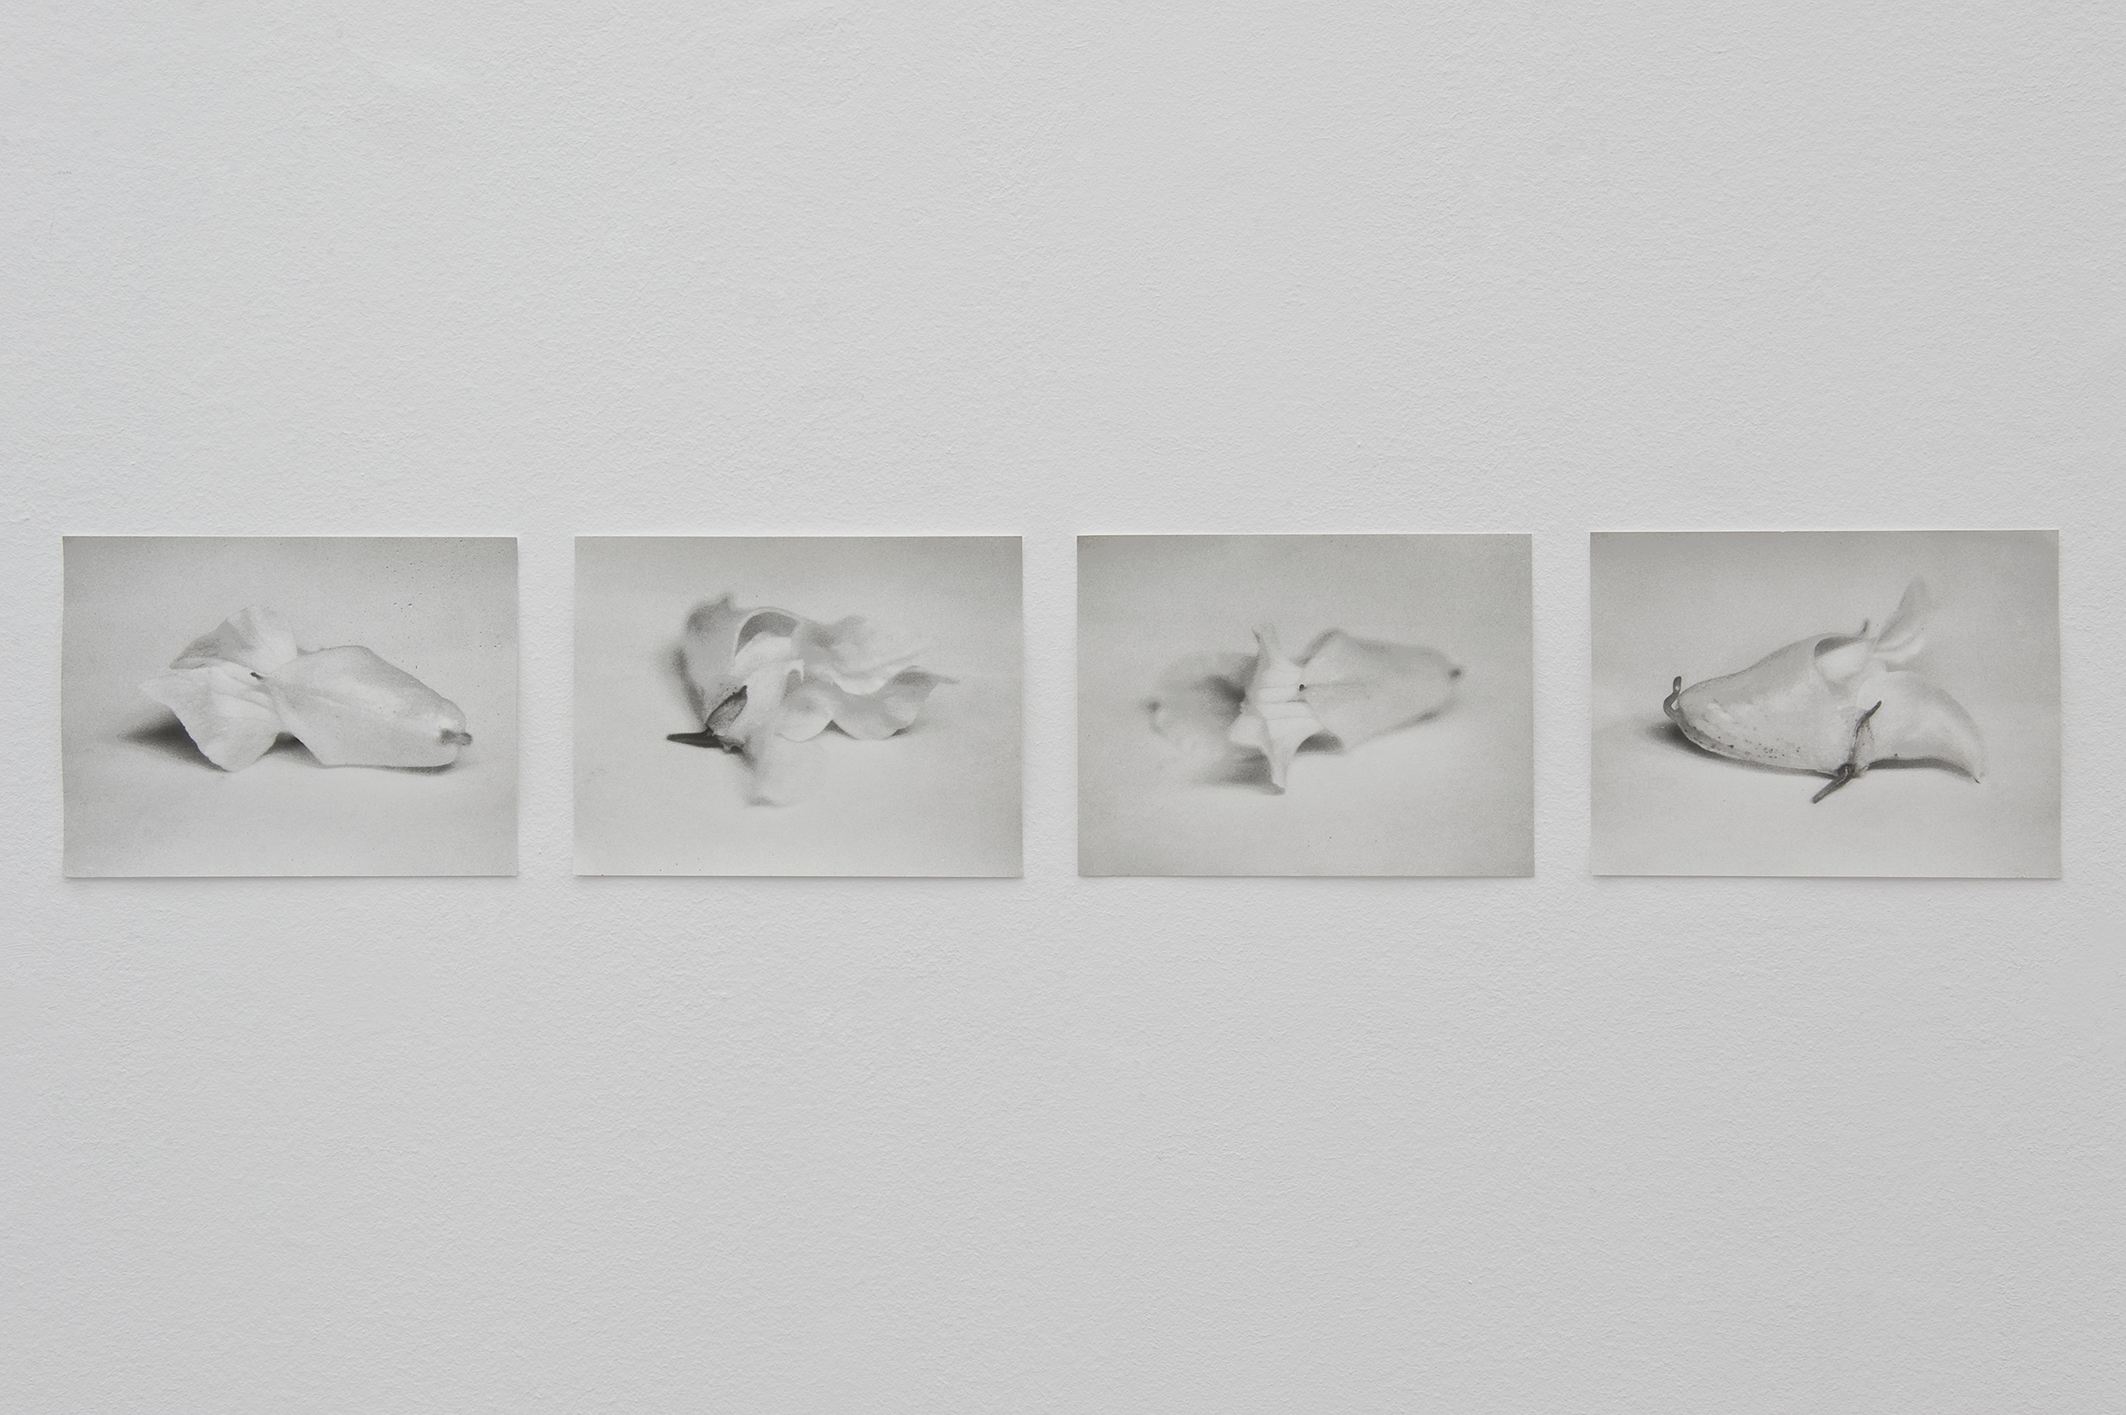 Untitled (Himalayan Balsam), 2014 | Jochen Lempert | ProjecteSD